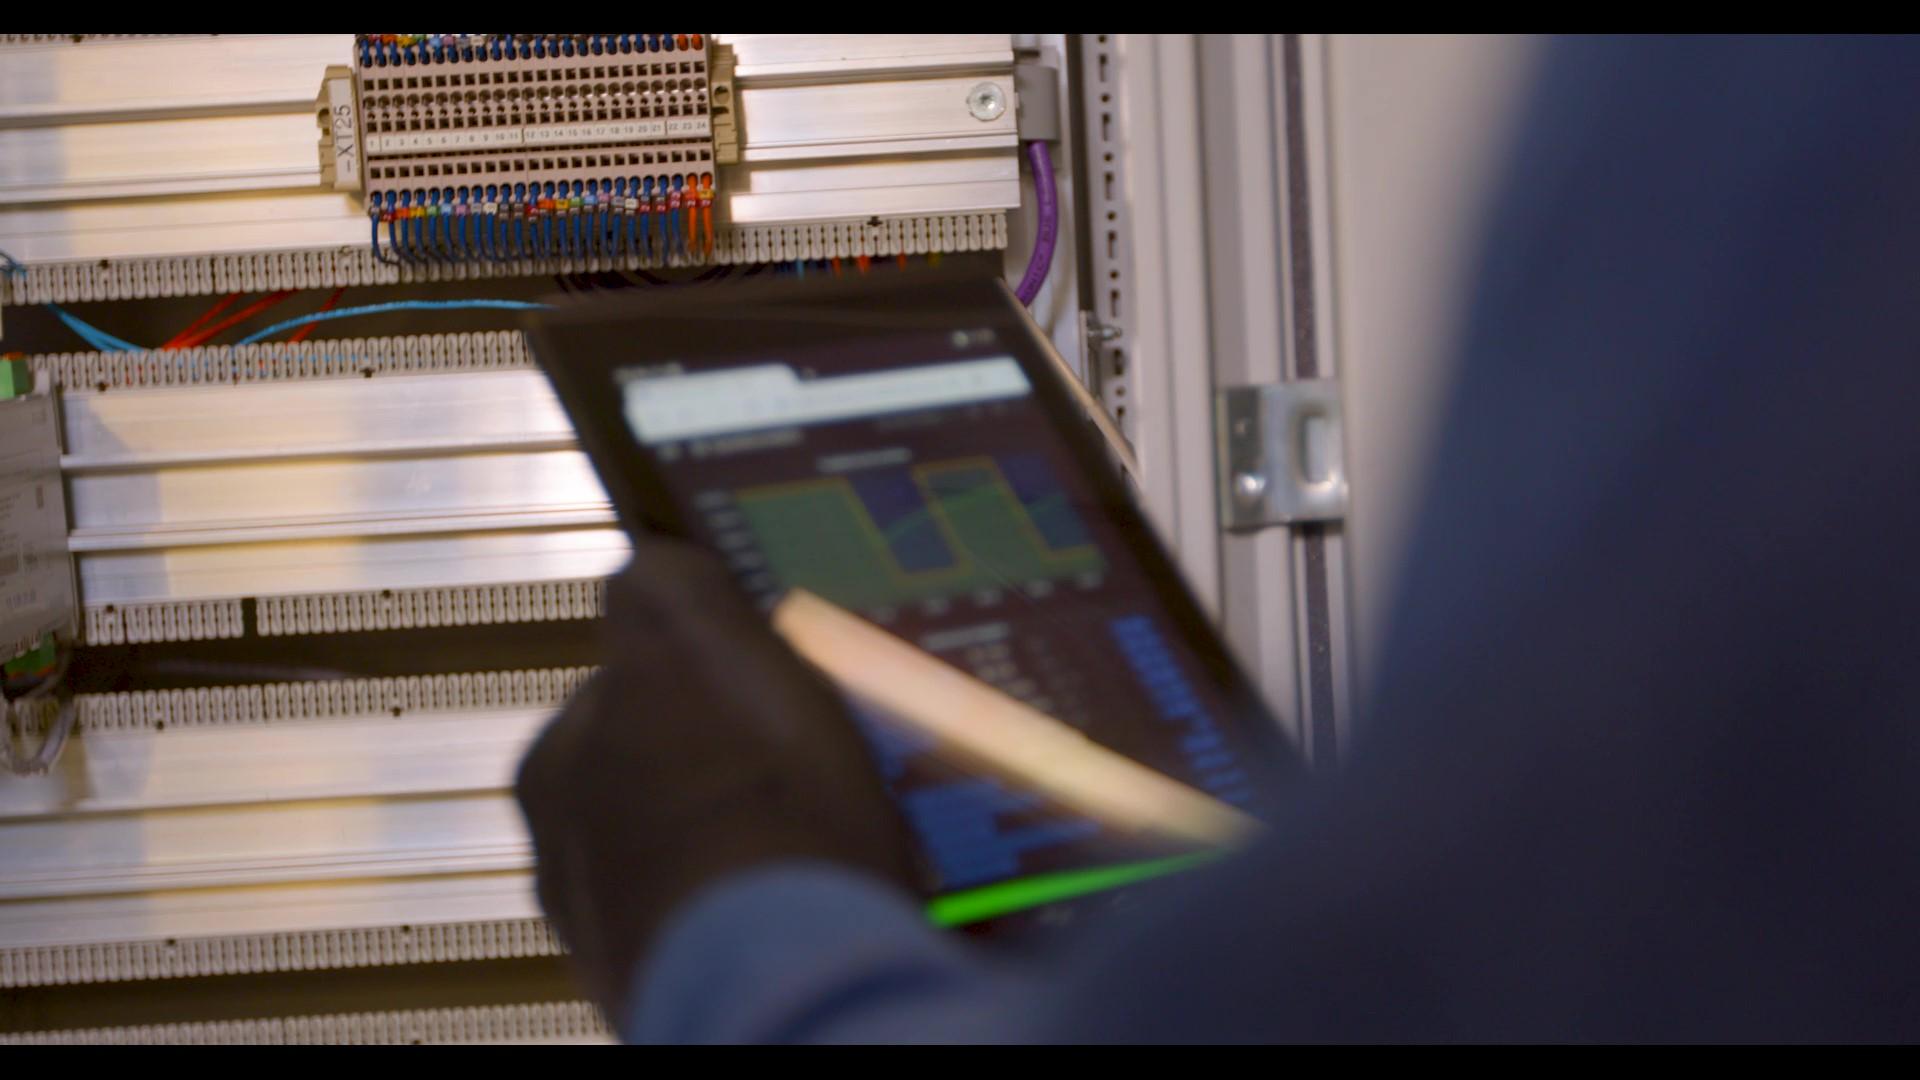 Digital Agro Connection gera resultados positivos com tecnologia de internet das coisas